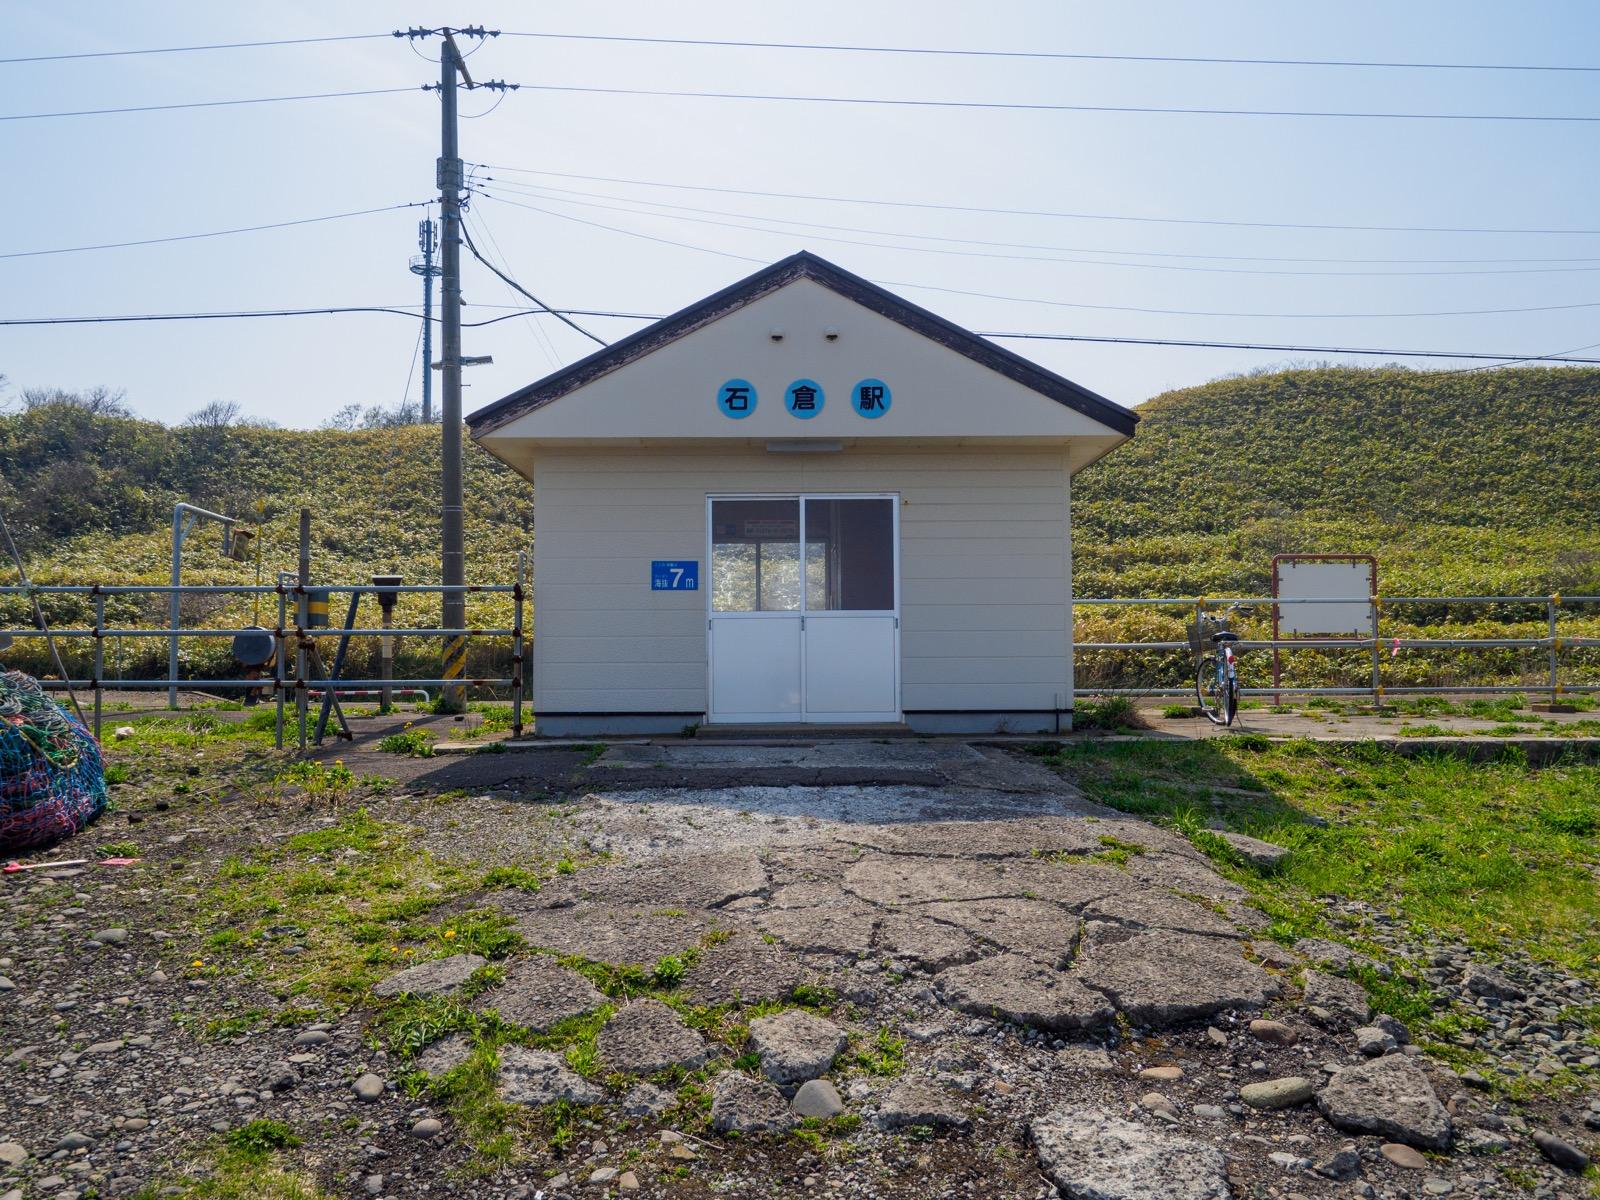 石倉駅の駅舎(待合室)